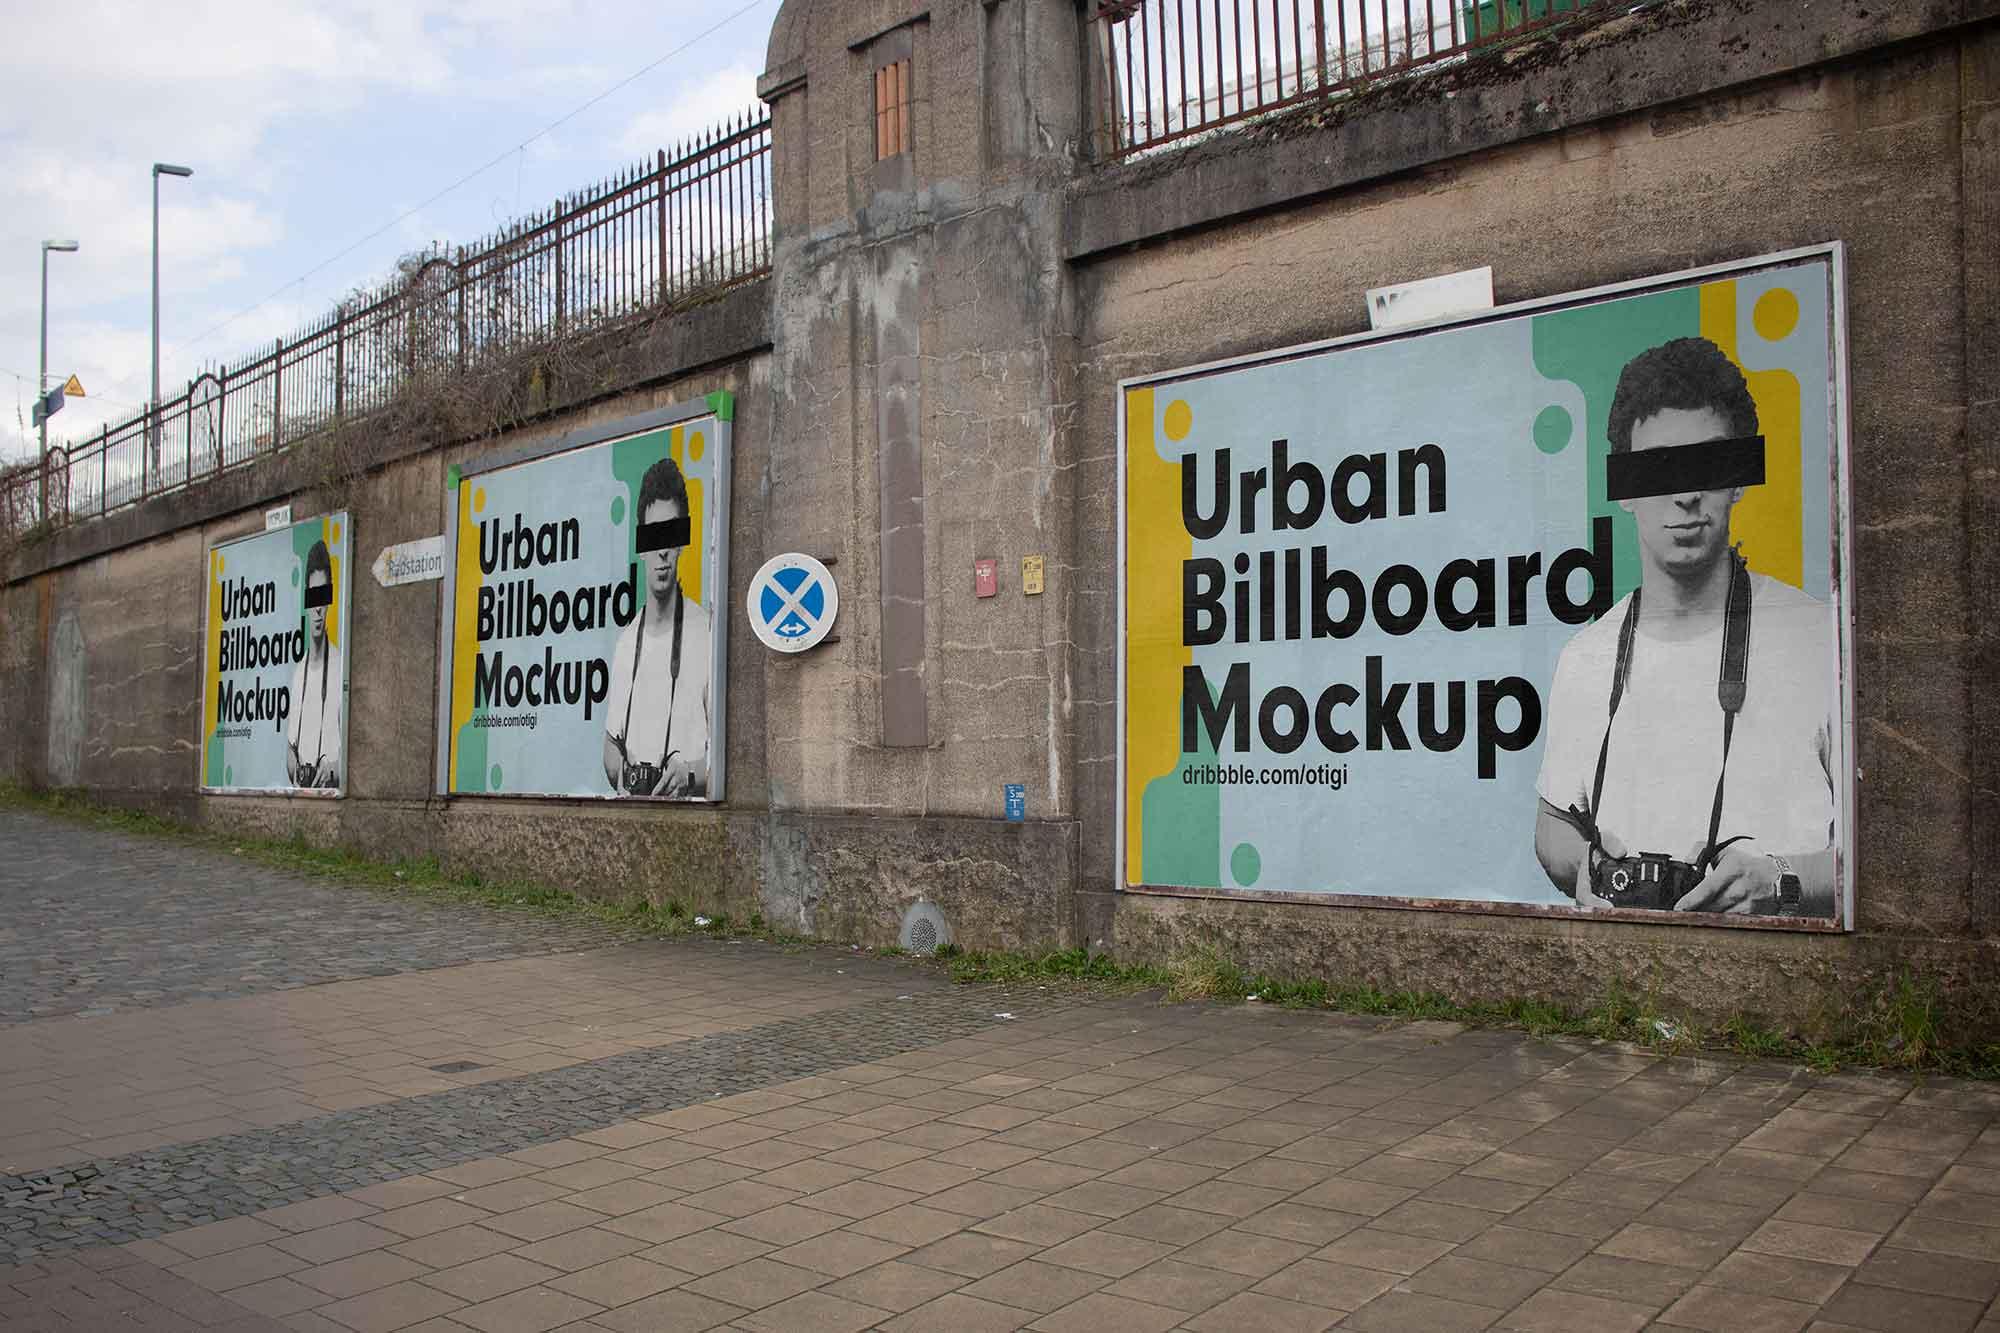 Urban Billboards Mockup